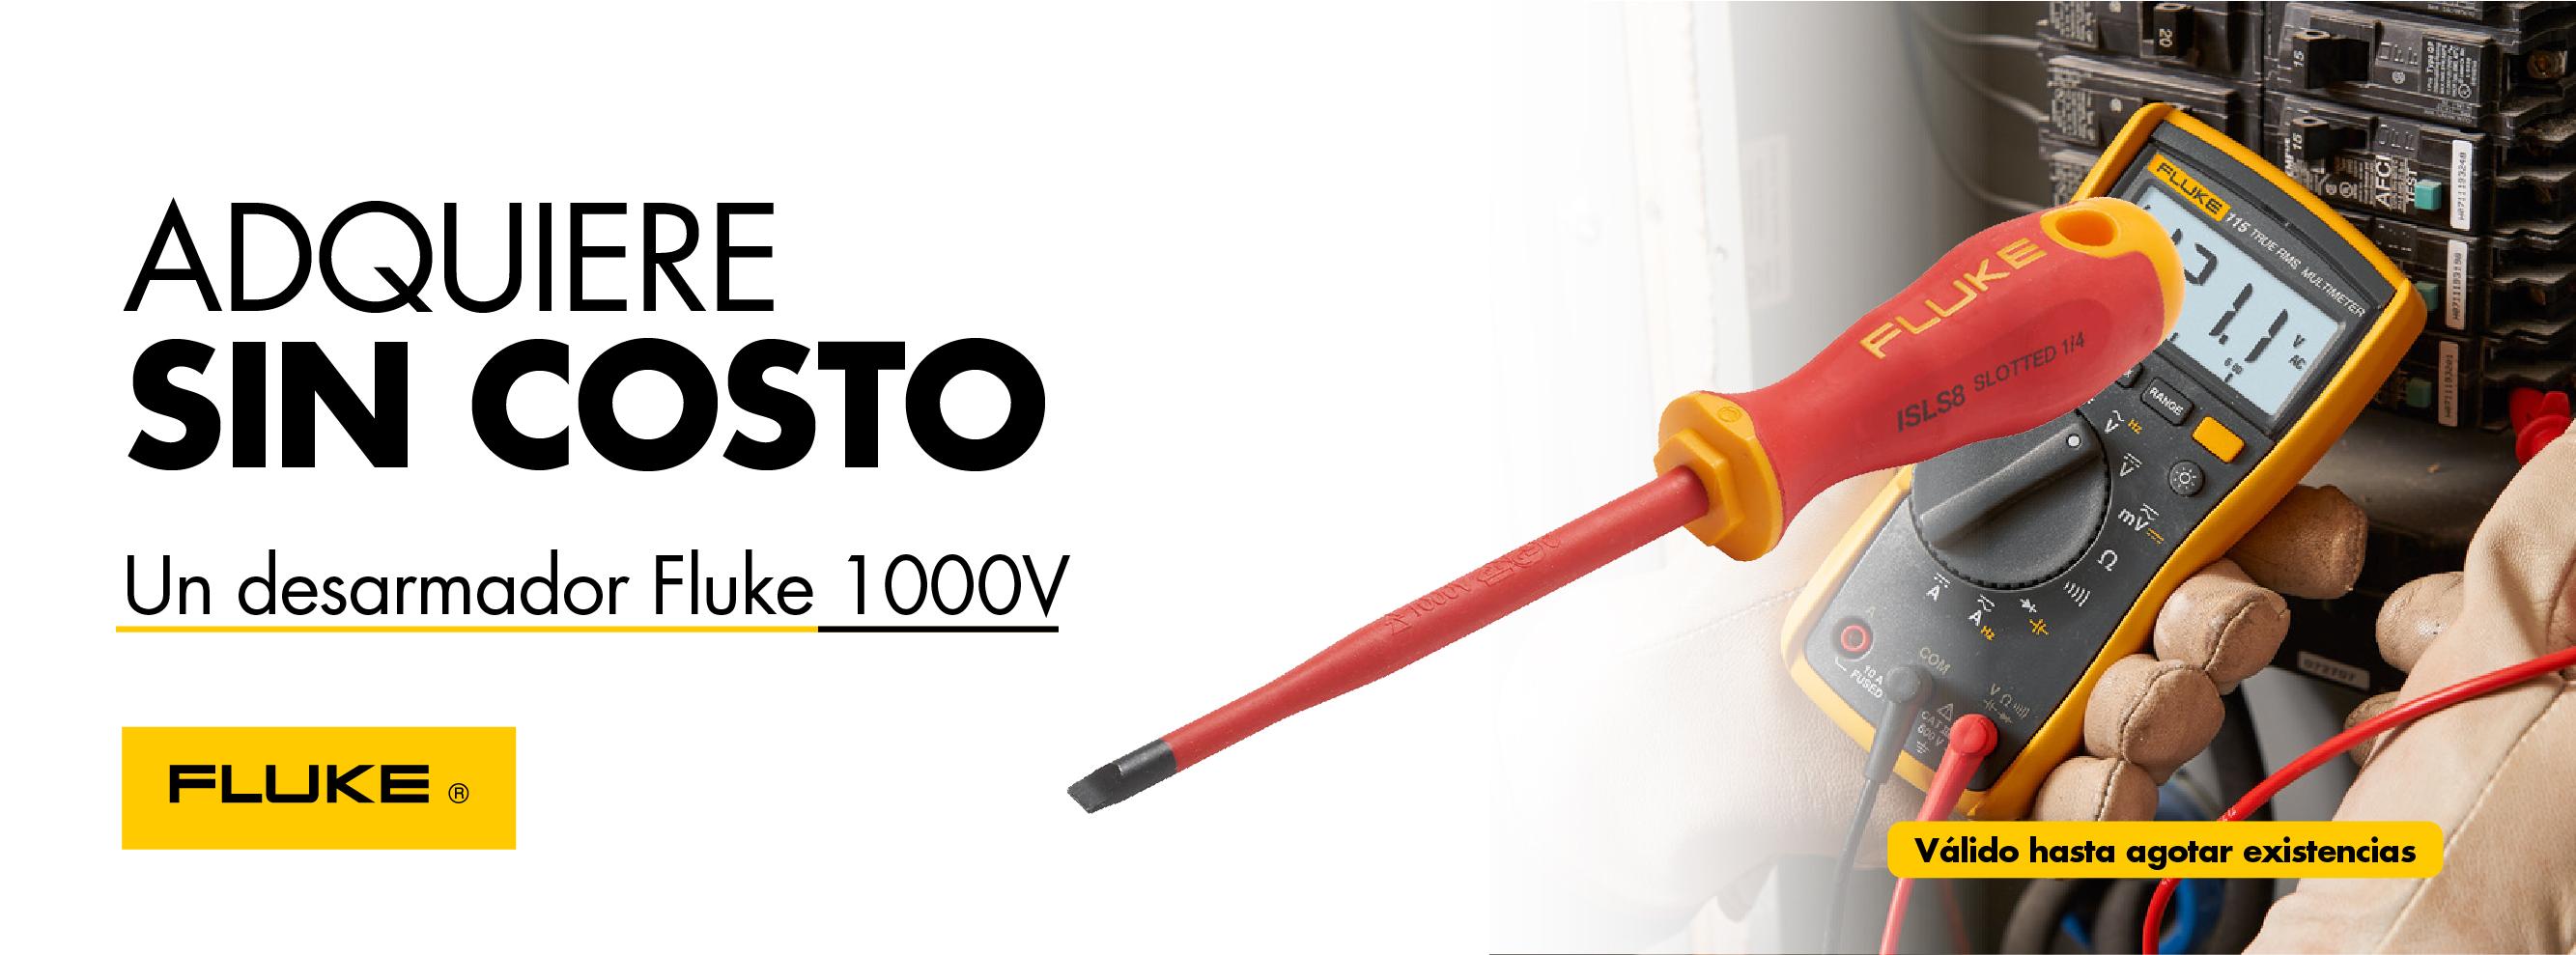 Obtén gratis un desarmador Fluke 1000V